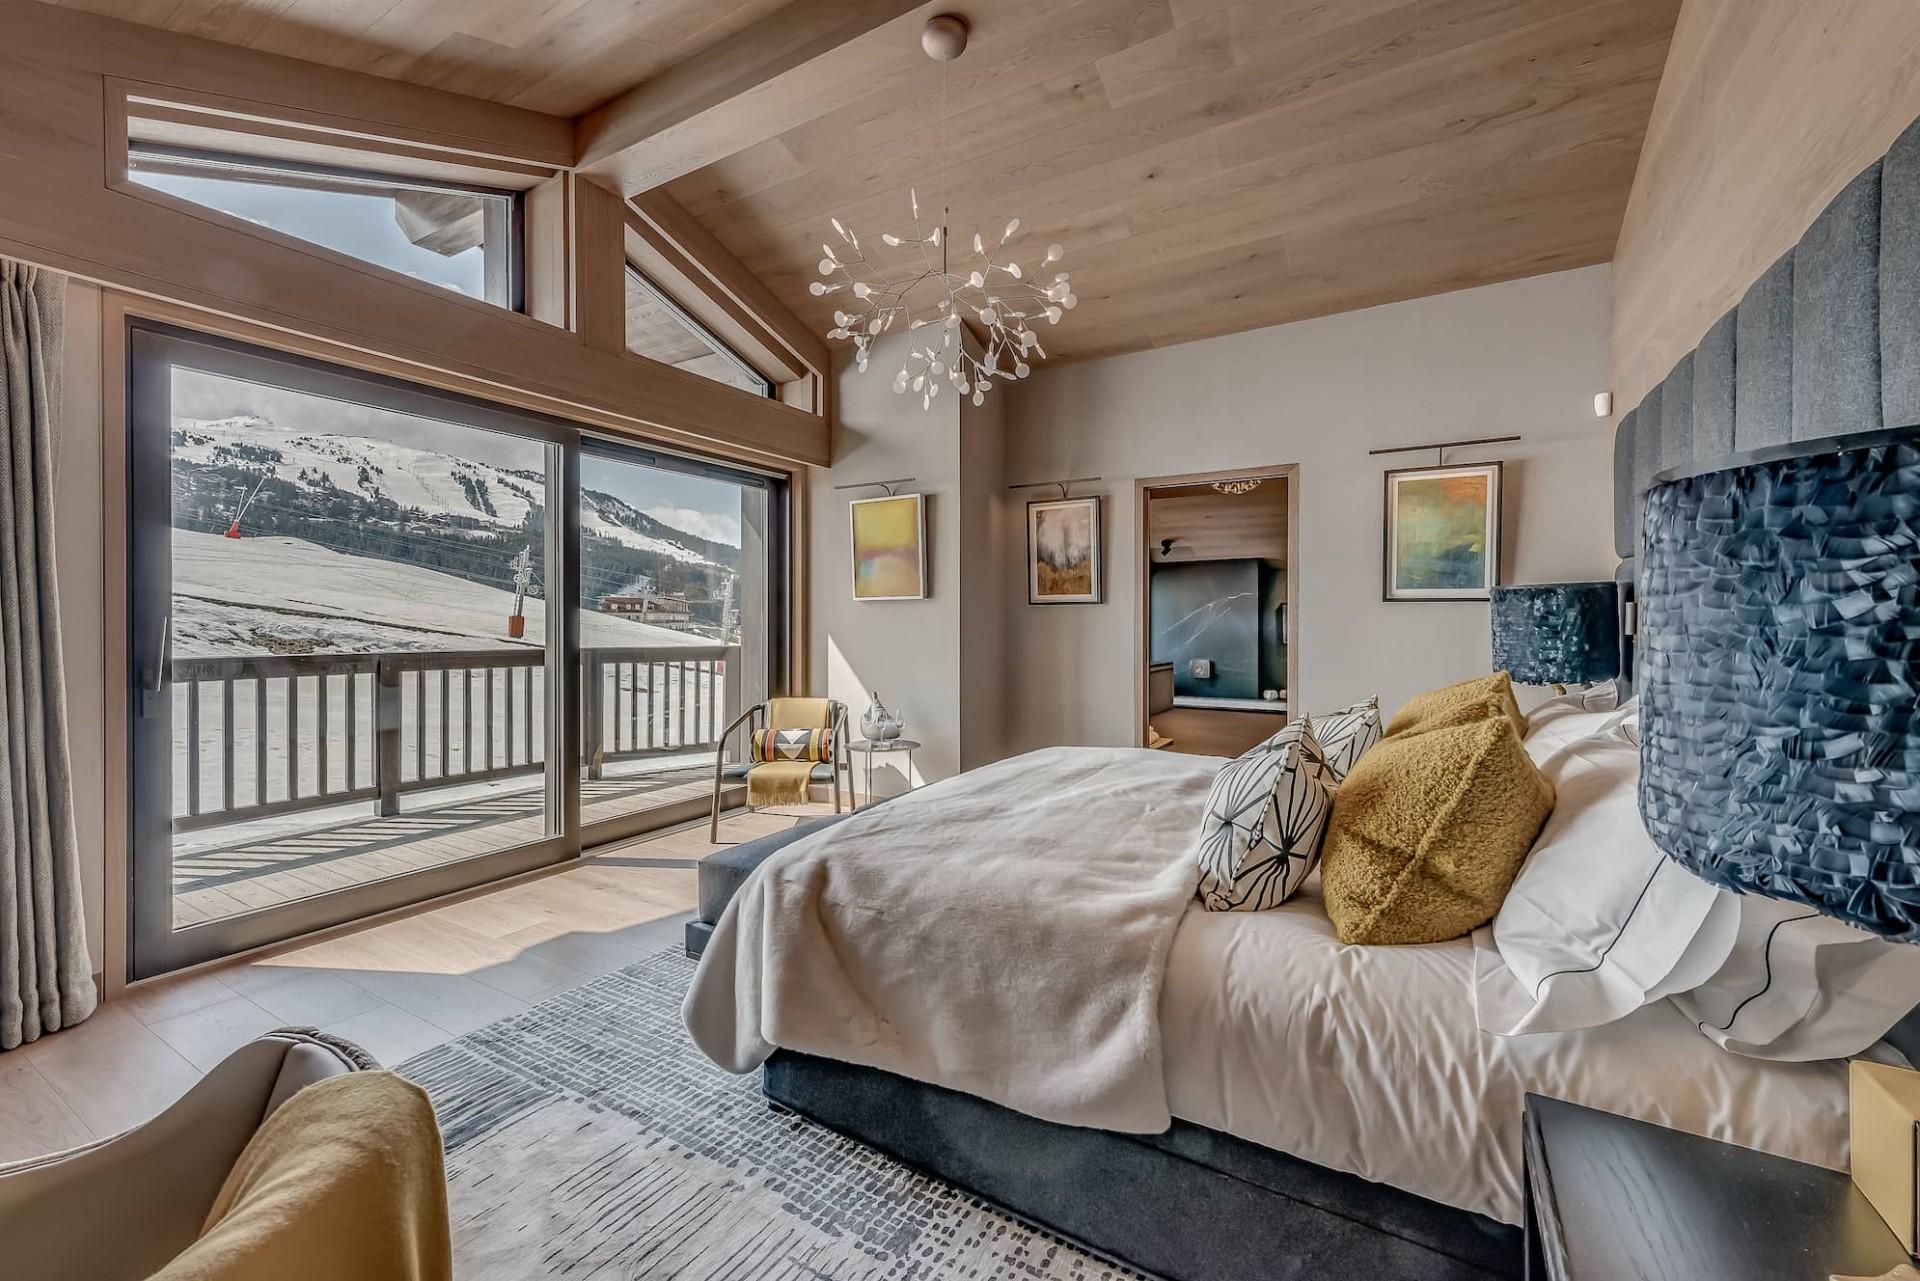 Courchevel 1650 Luxury Rental Chalet Elana Bedroom 7